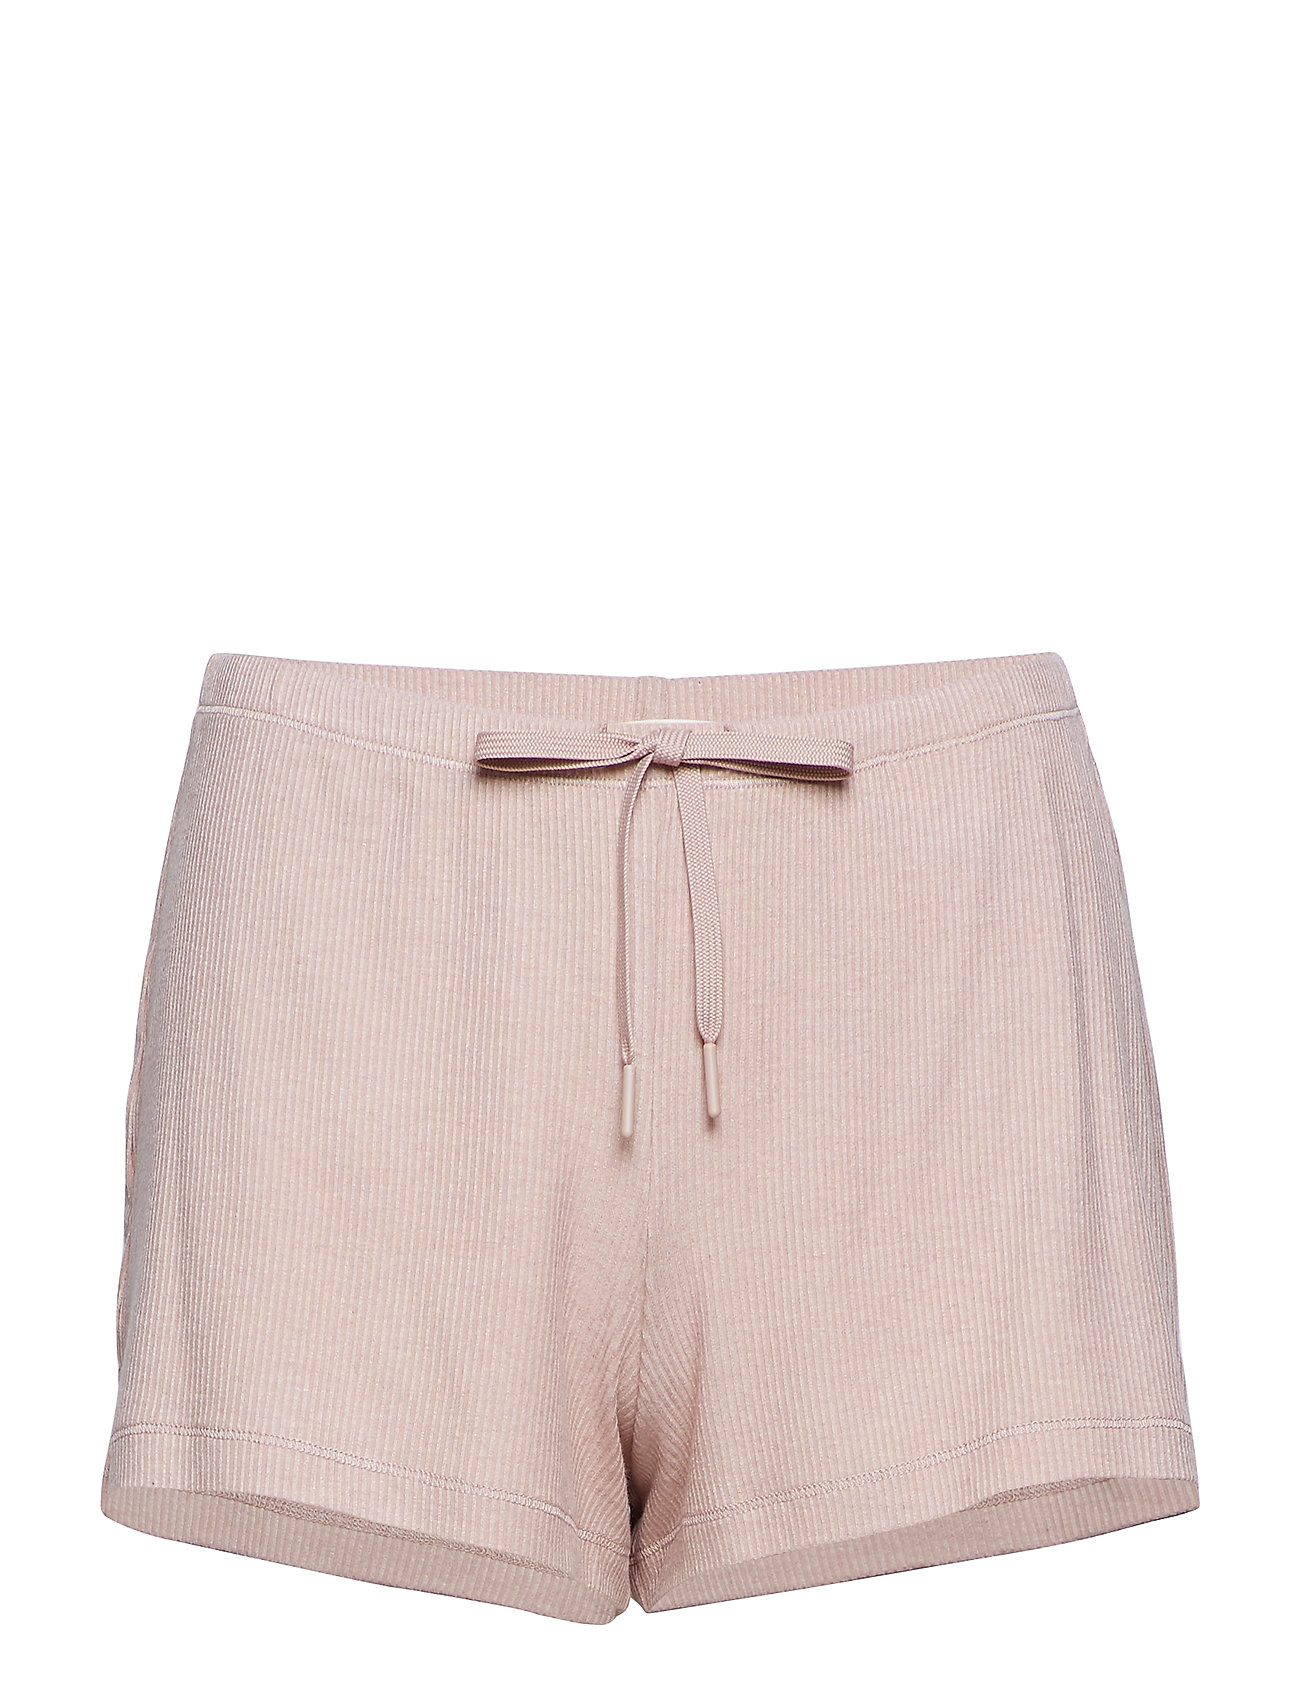 Filippa K Soft Sport Silky Jersey Shorts